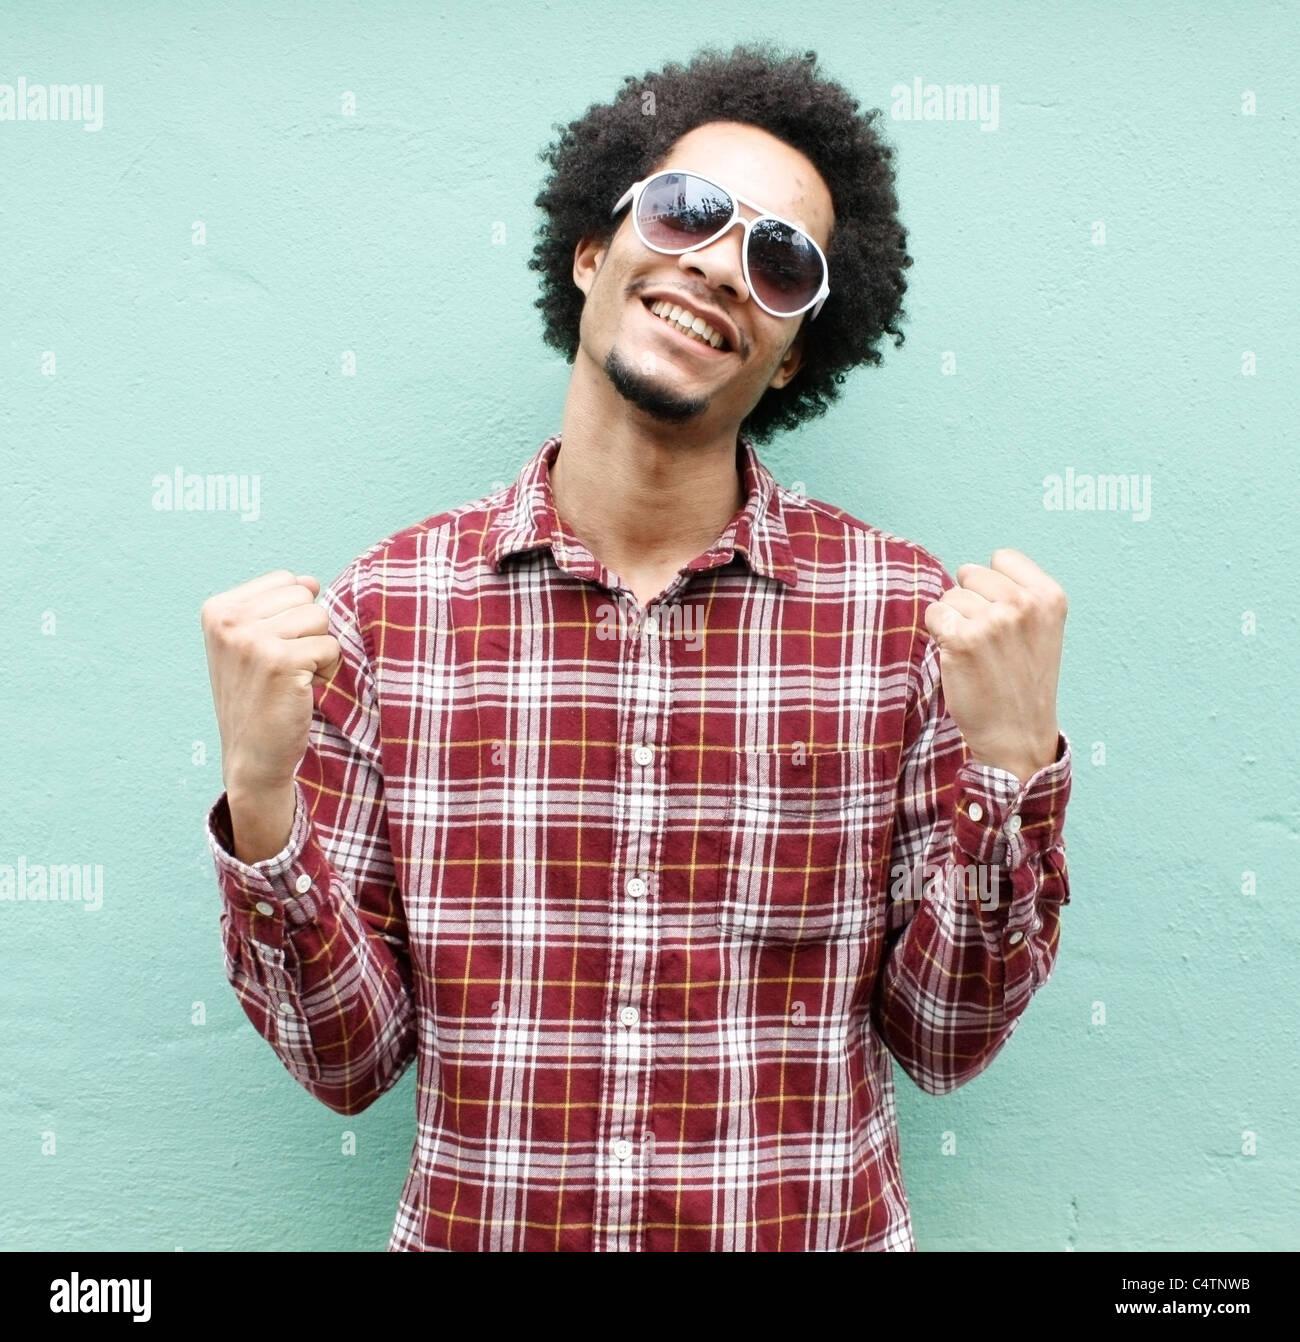 Guy - Stock Image